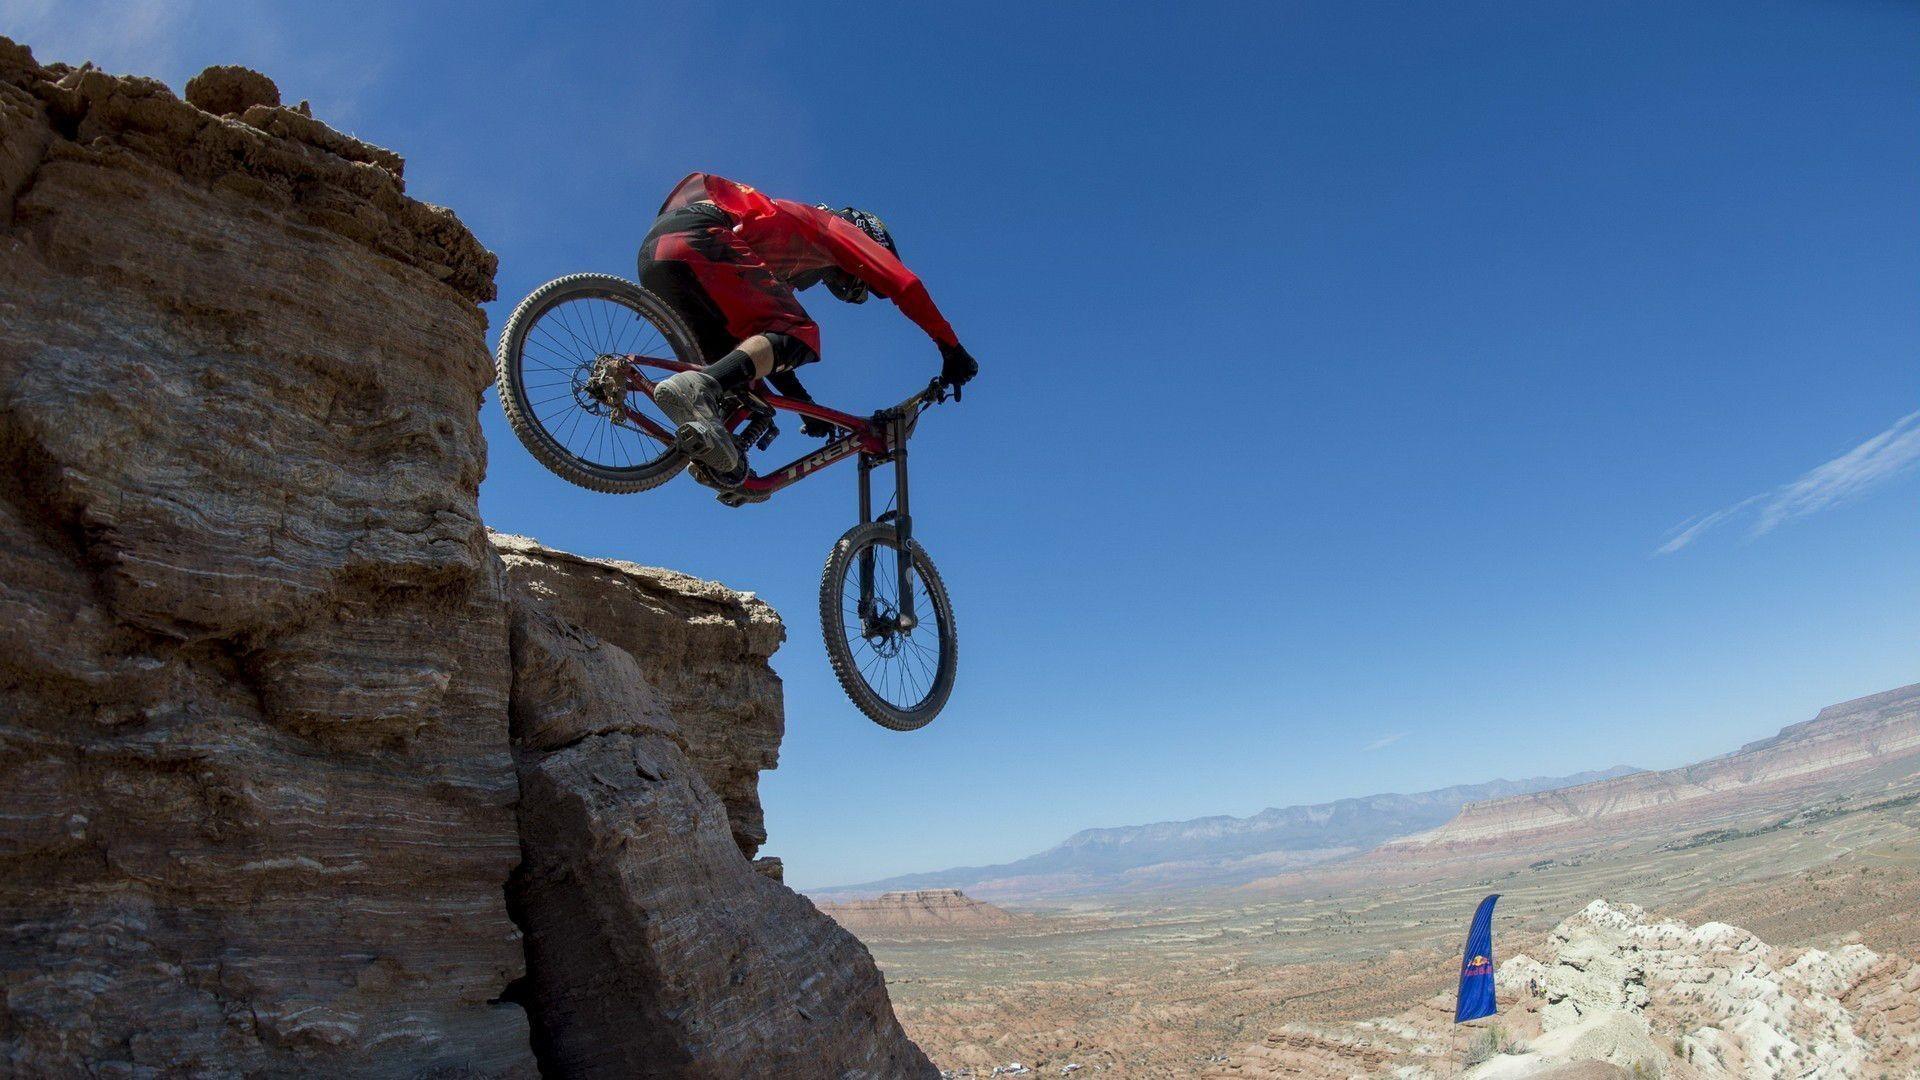 Cool Mountain Bike Sport Wallpaper HD 175 #3644 Wallpaper